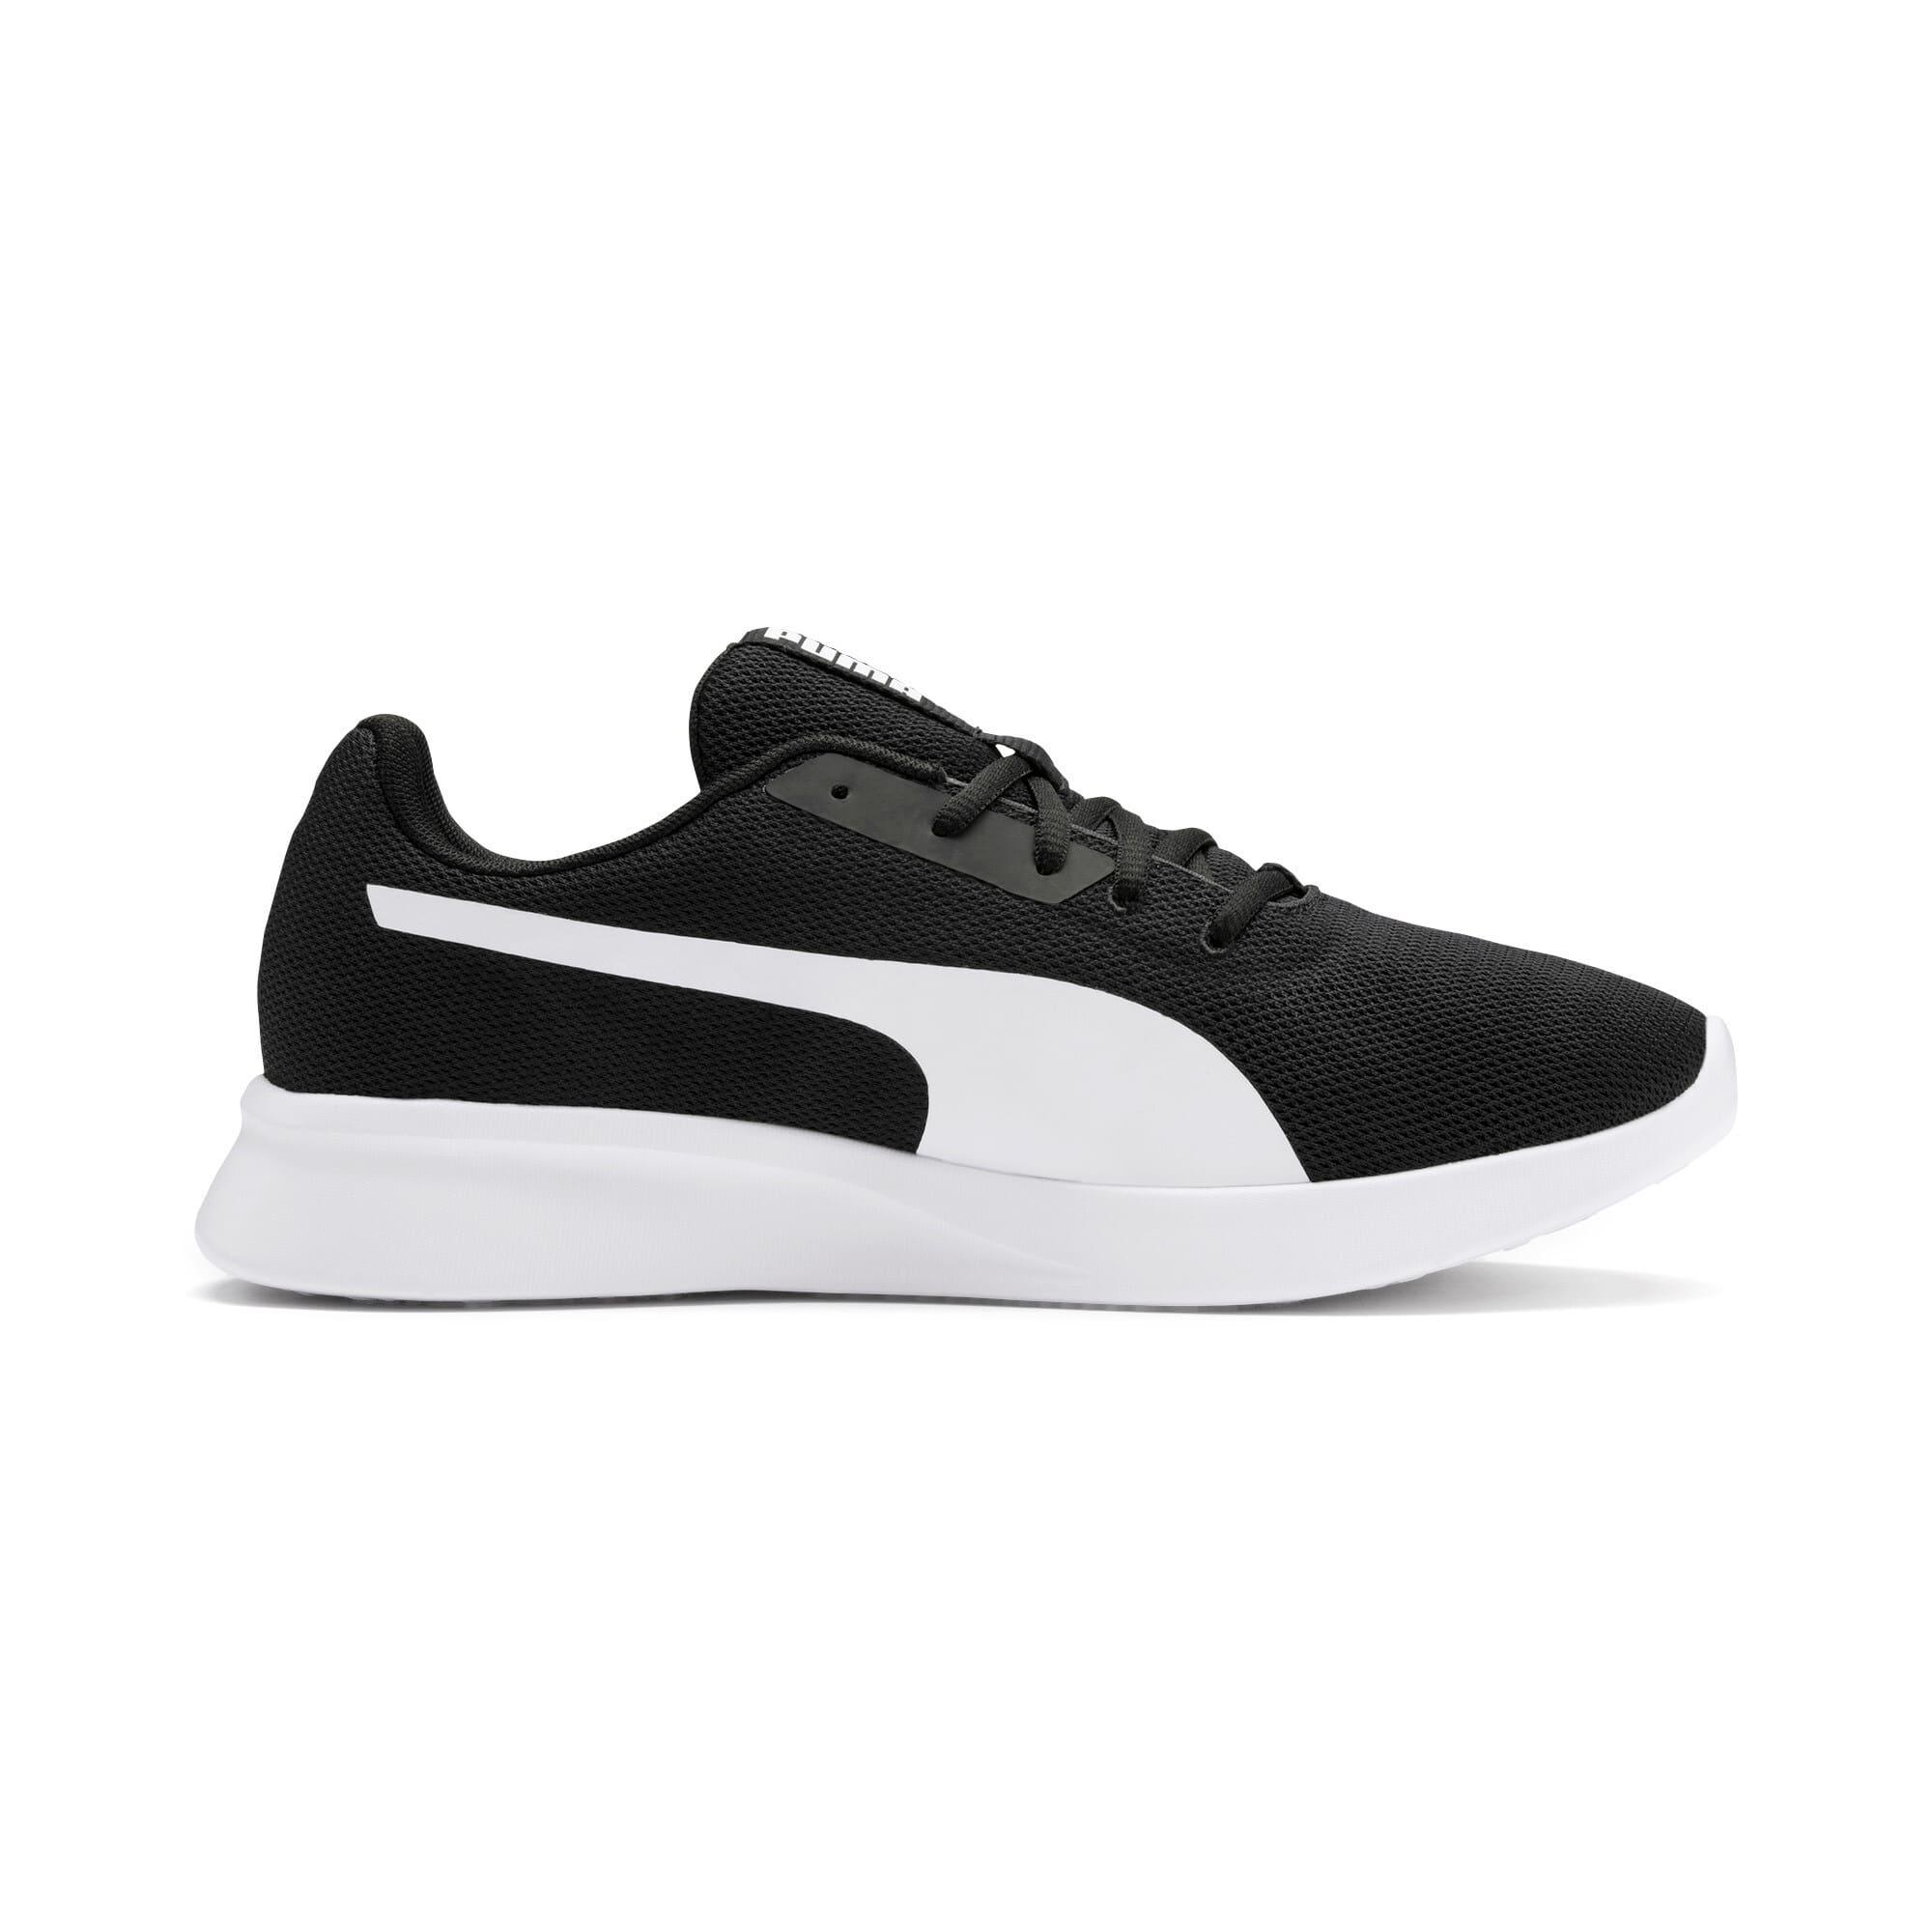 Thumbnail 7 of Modern Runner Sneakers, Puma Black-Puma White, medium-IND